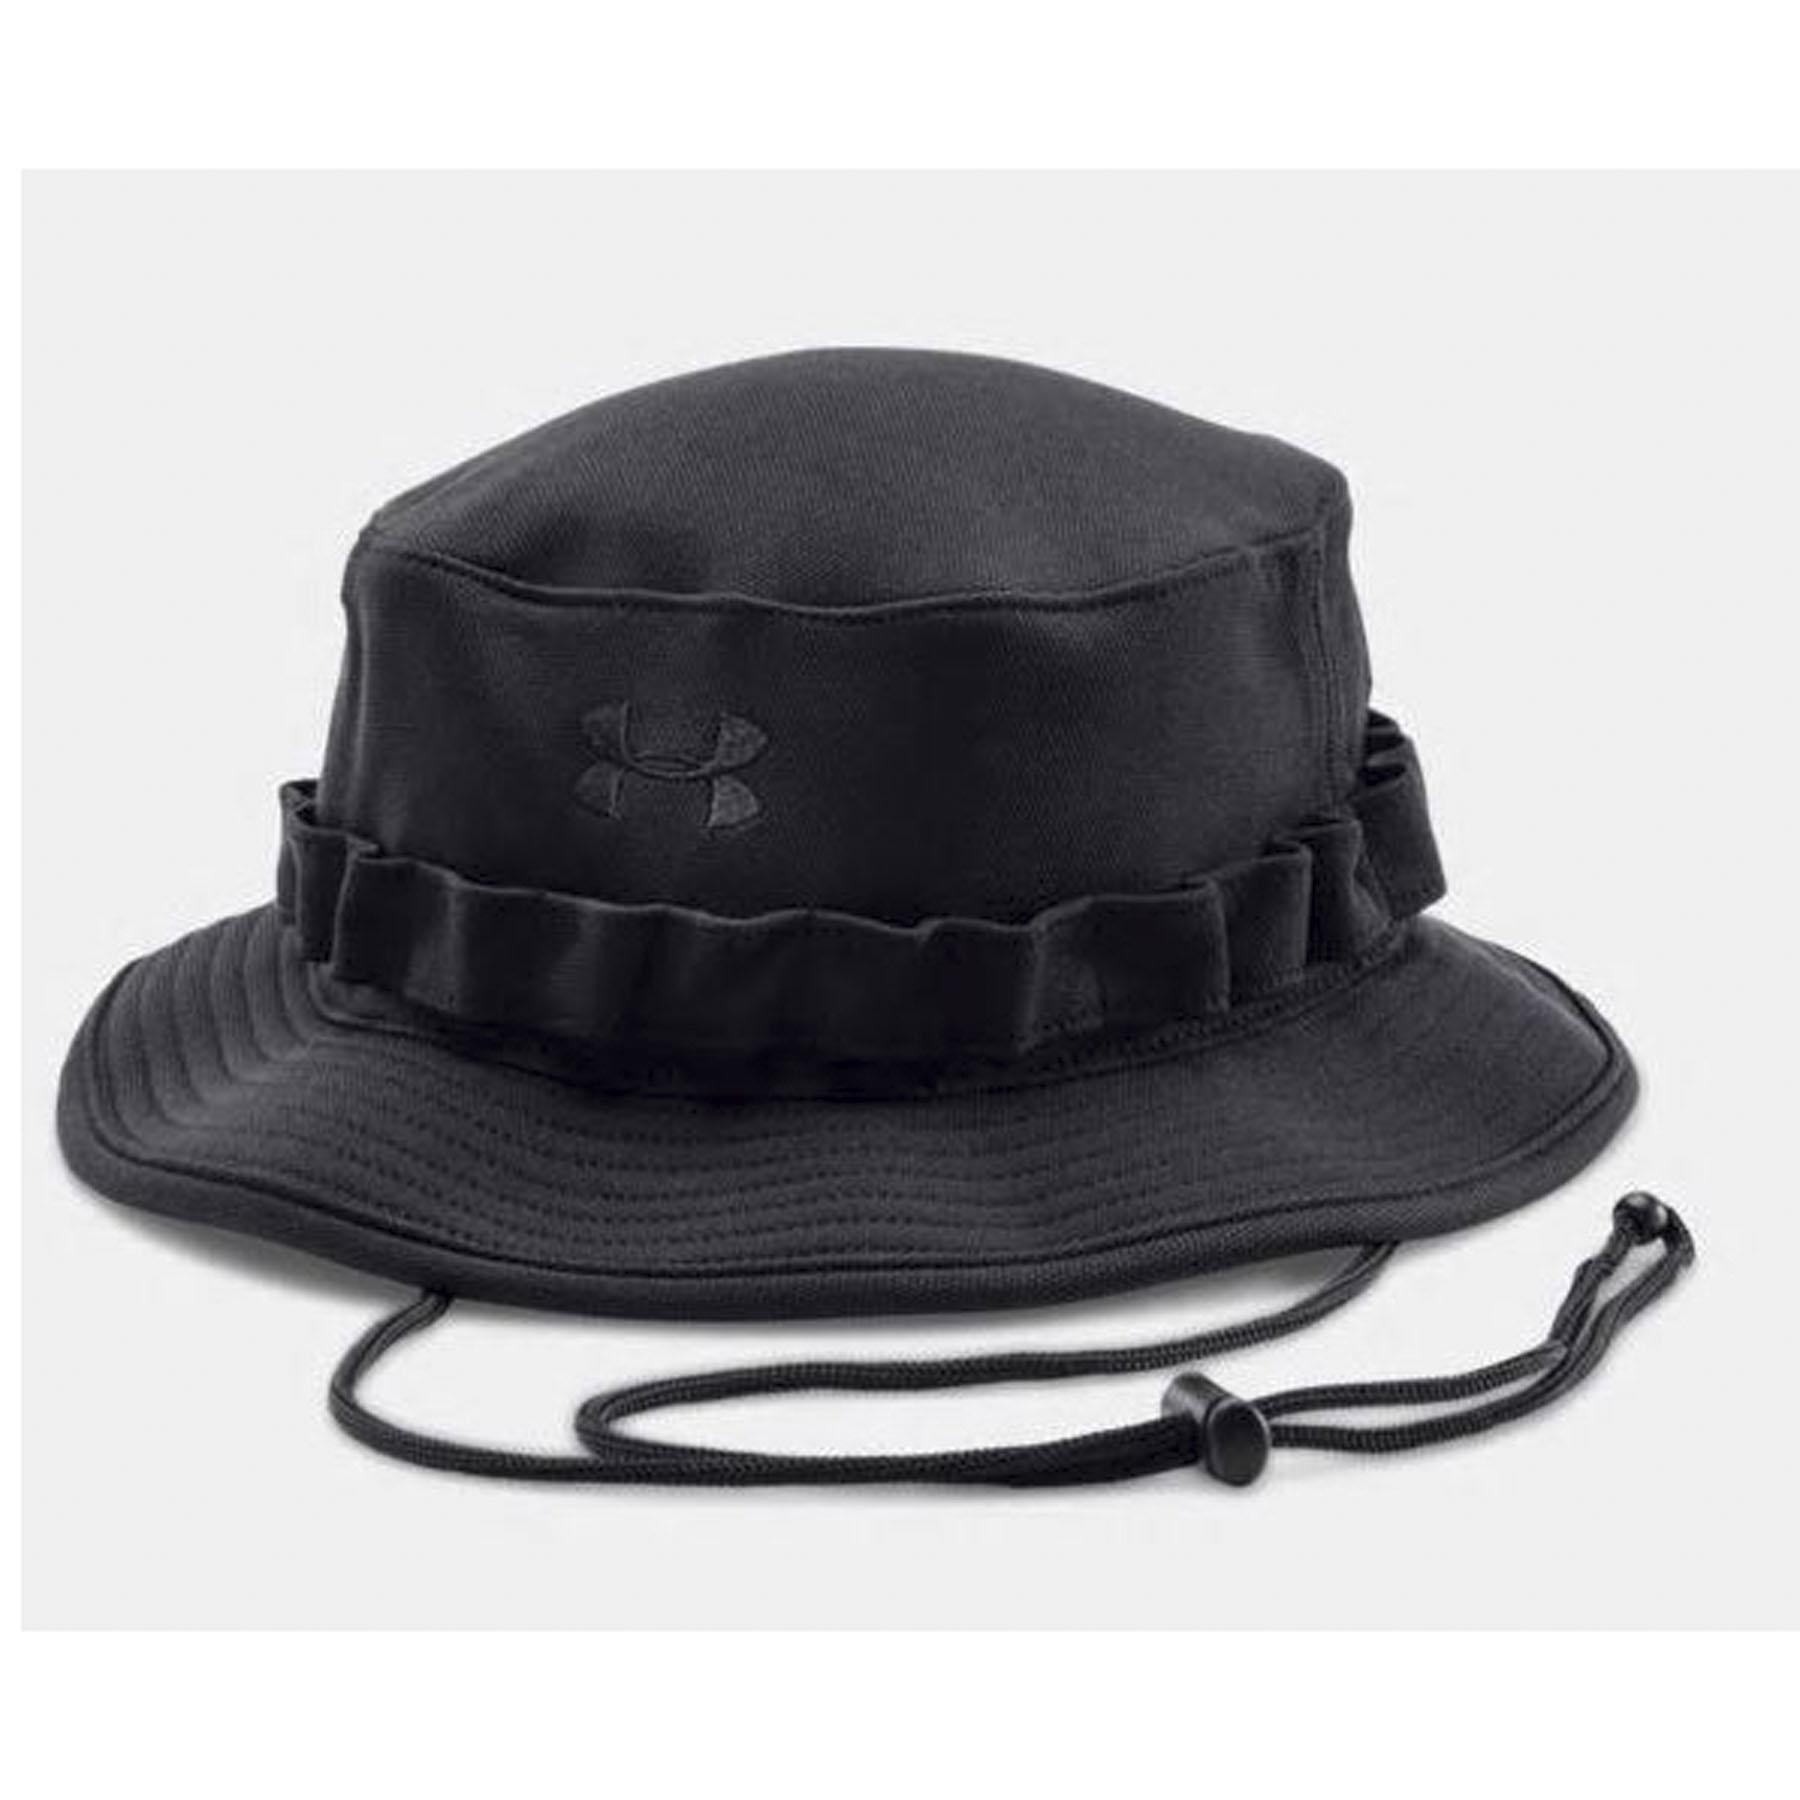 fe7a80da1ef Under Armour Police Hats